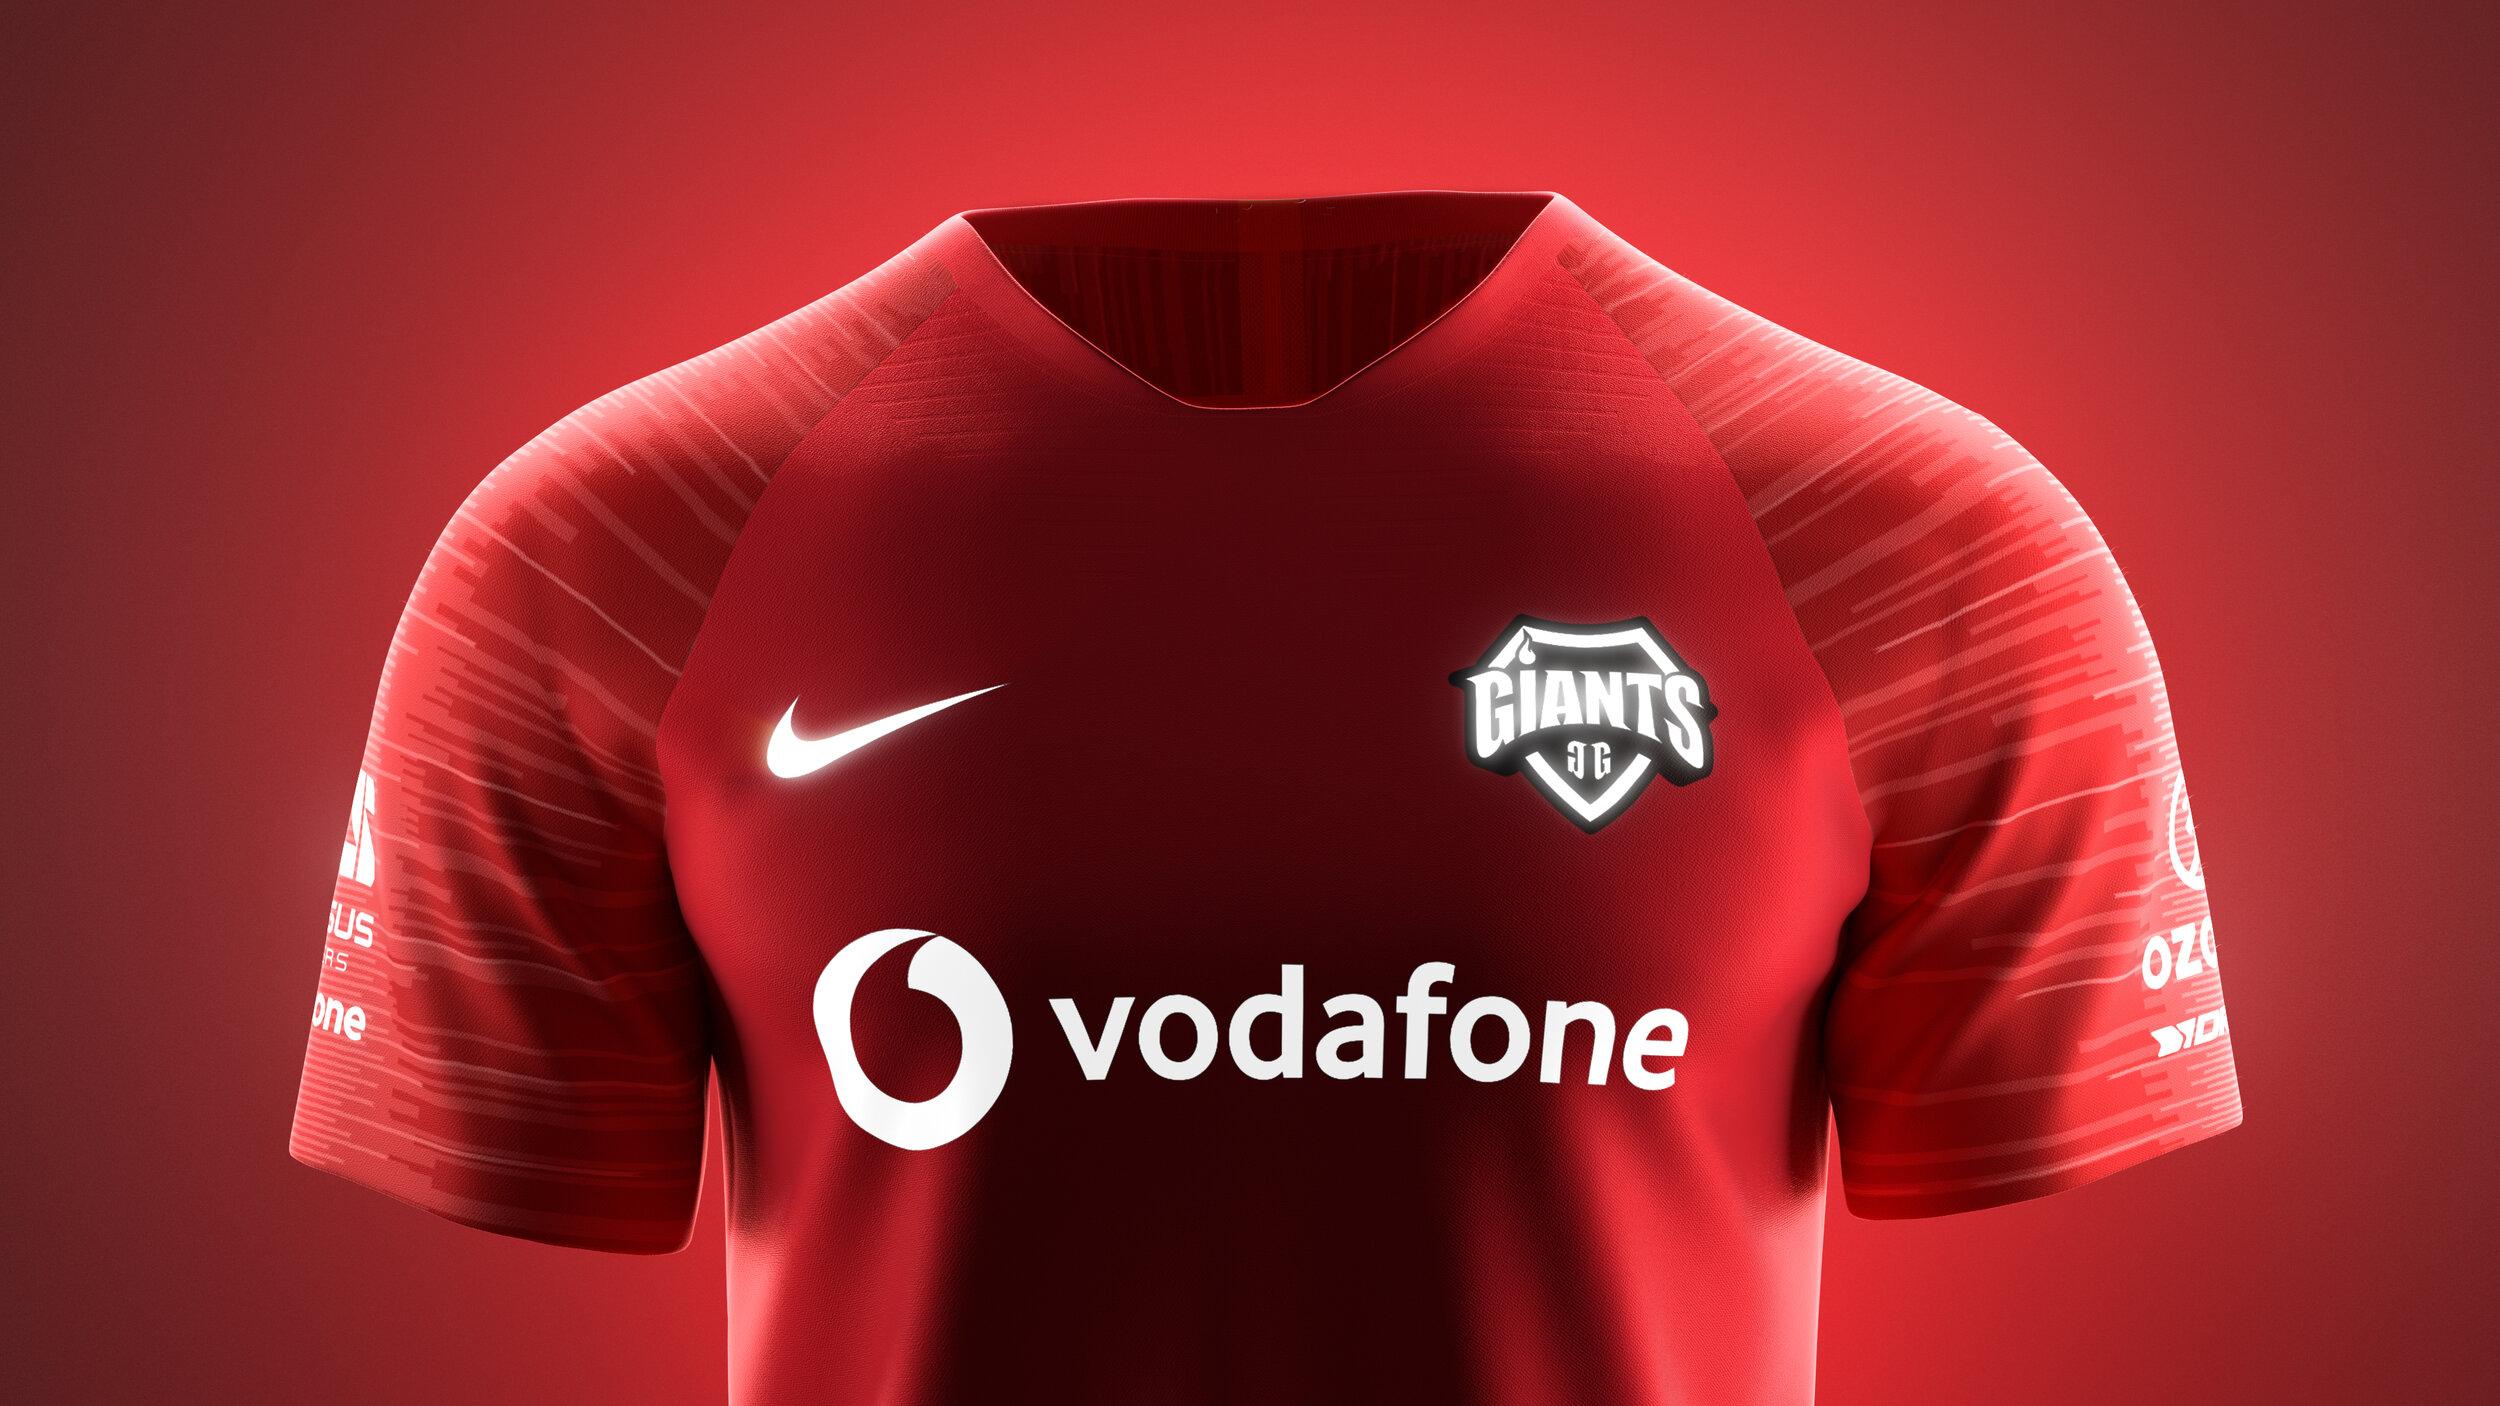 Muy enojado Consciente Llorar  Hitabarity 3D - Freelance 3D Designer — Nike X Giants